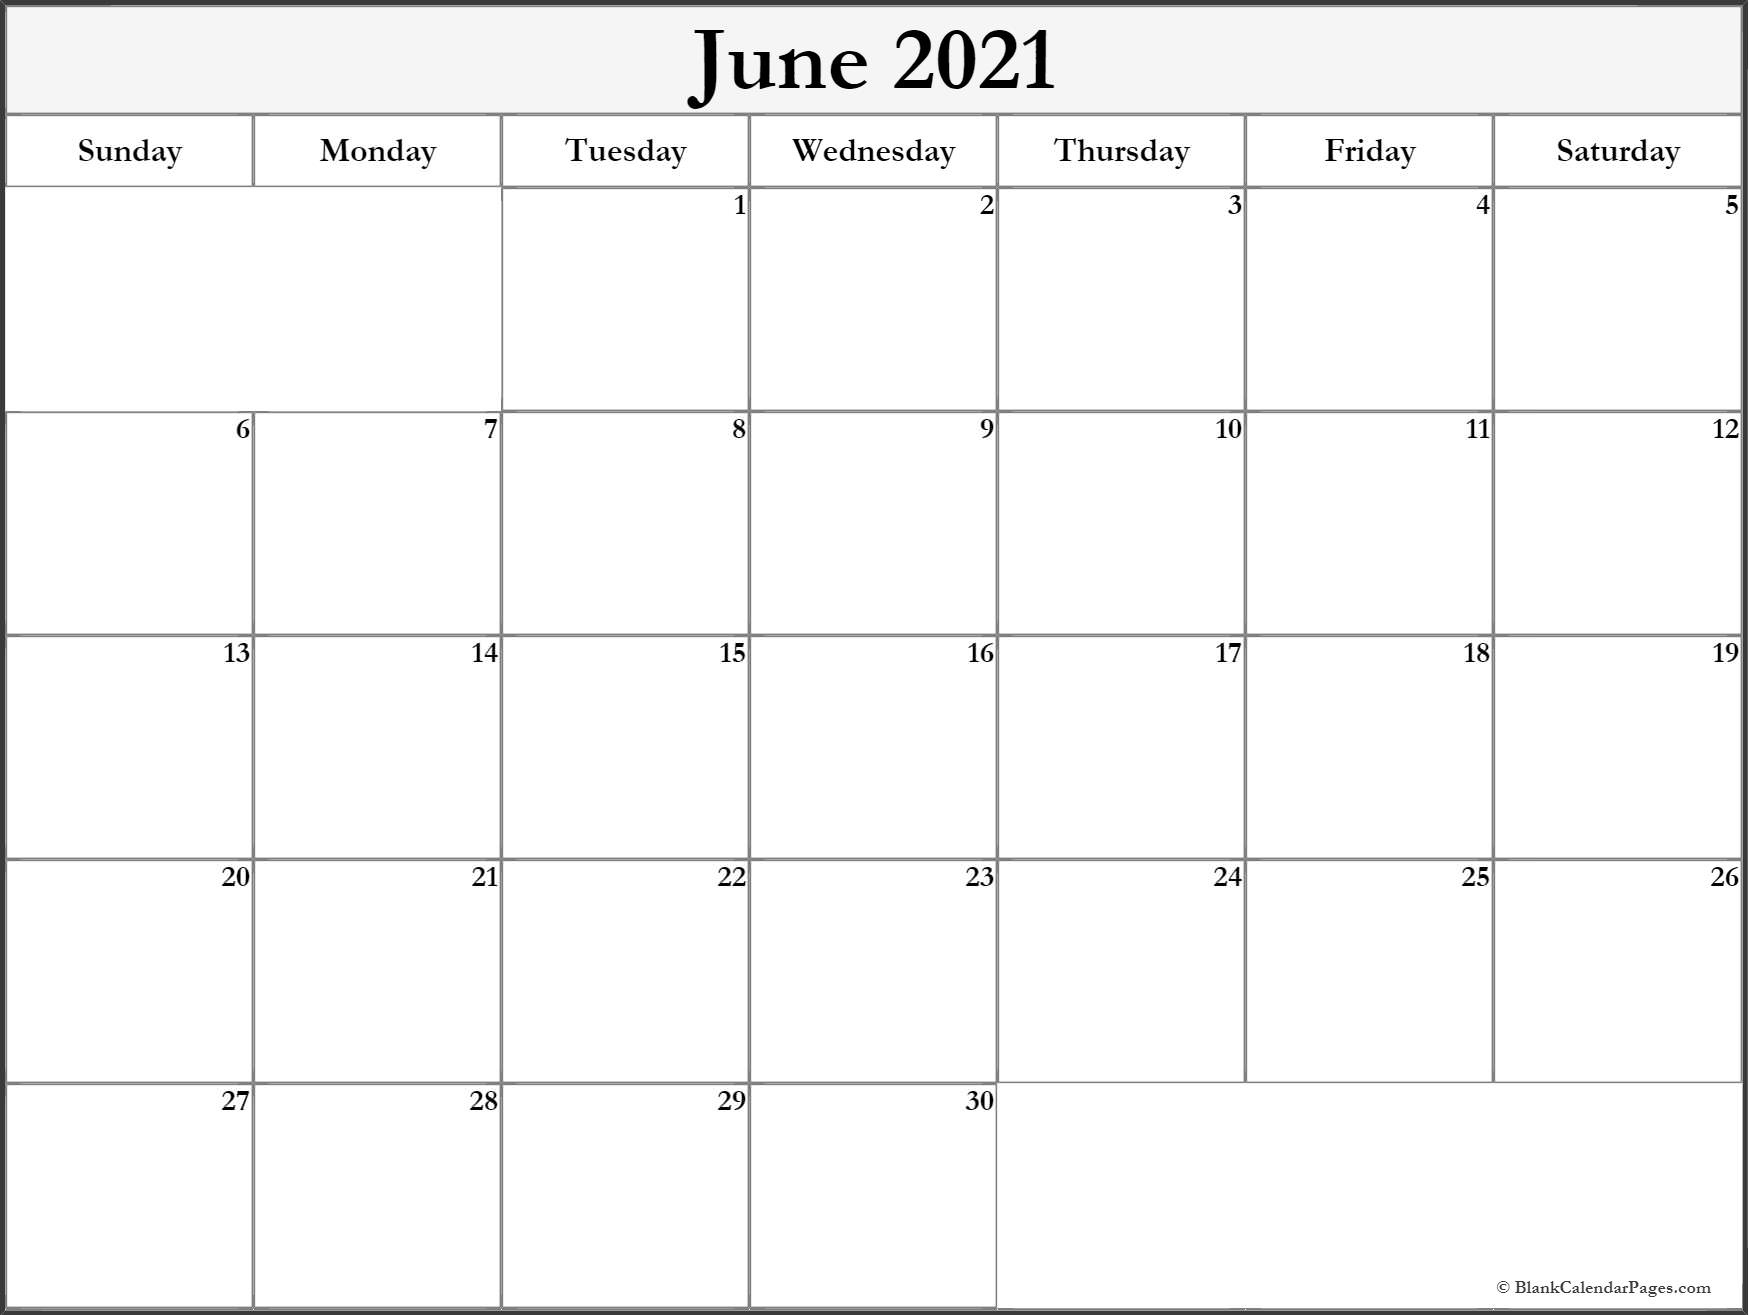 June 2021 Blank Calendar Templates. June 2021 Blank Calendar Printable